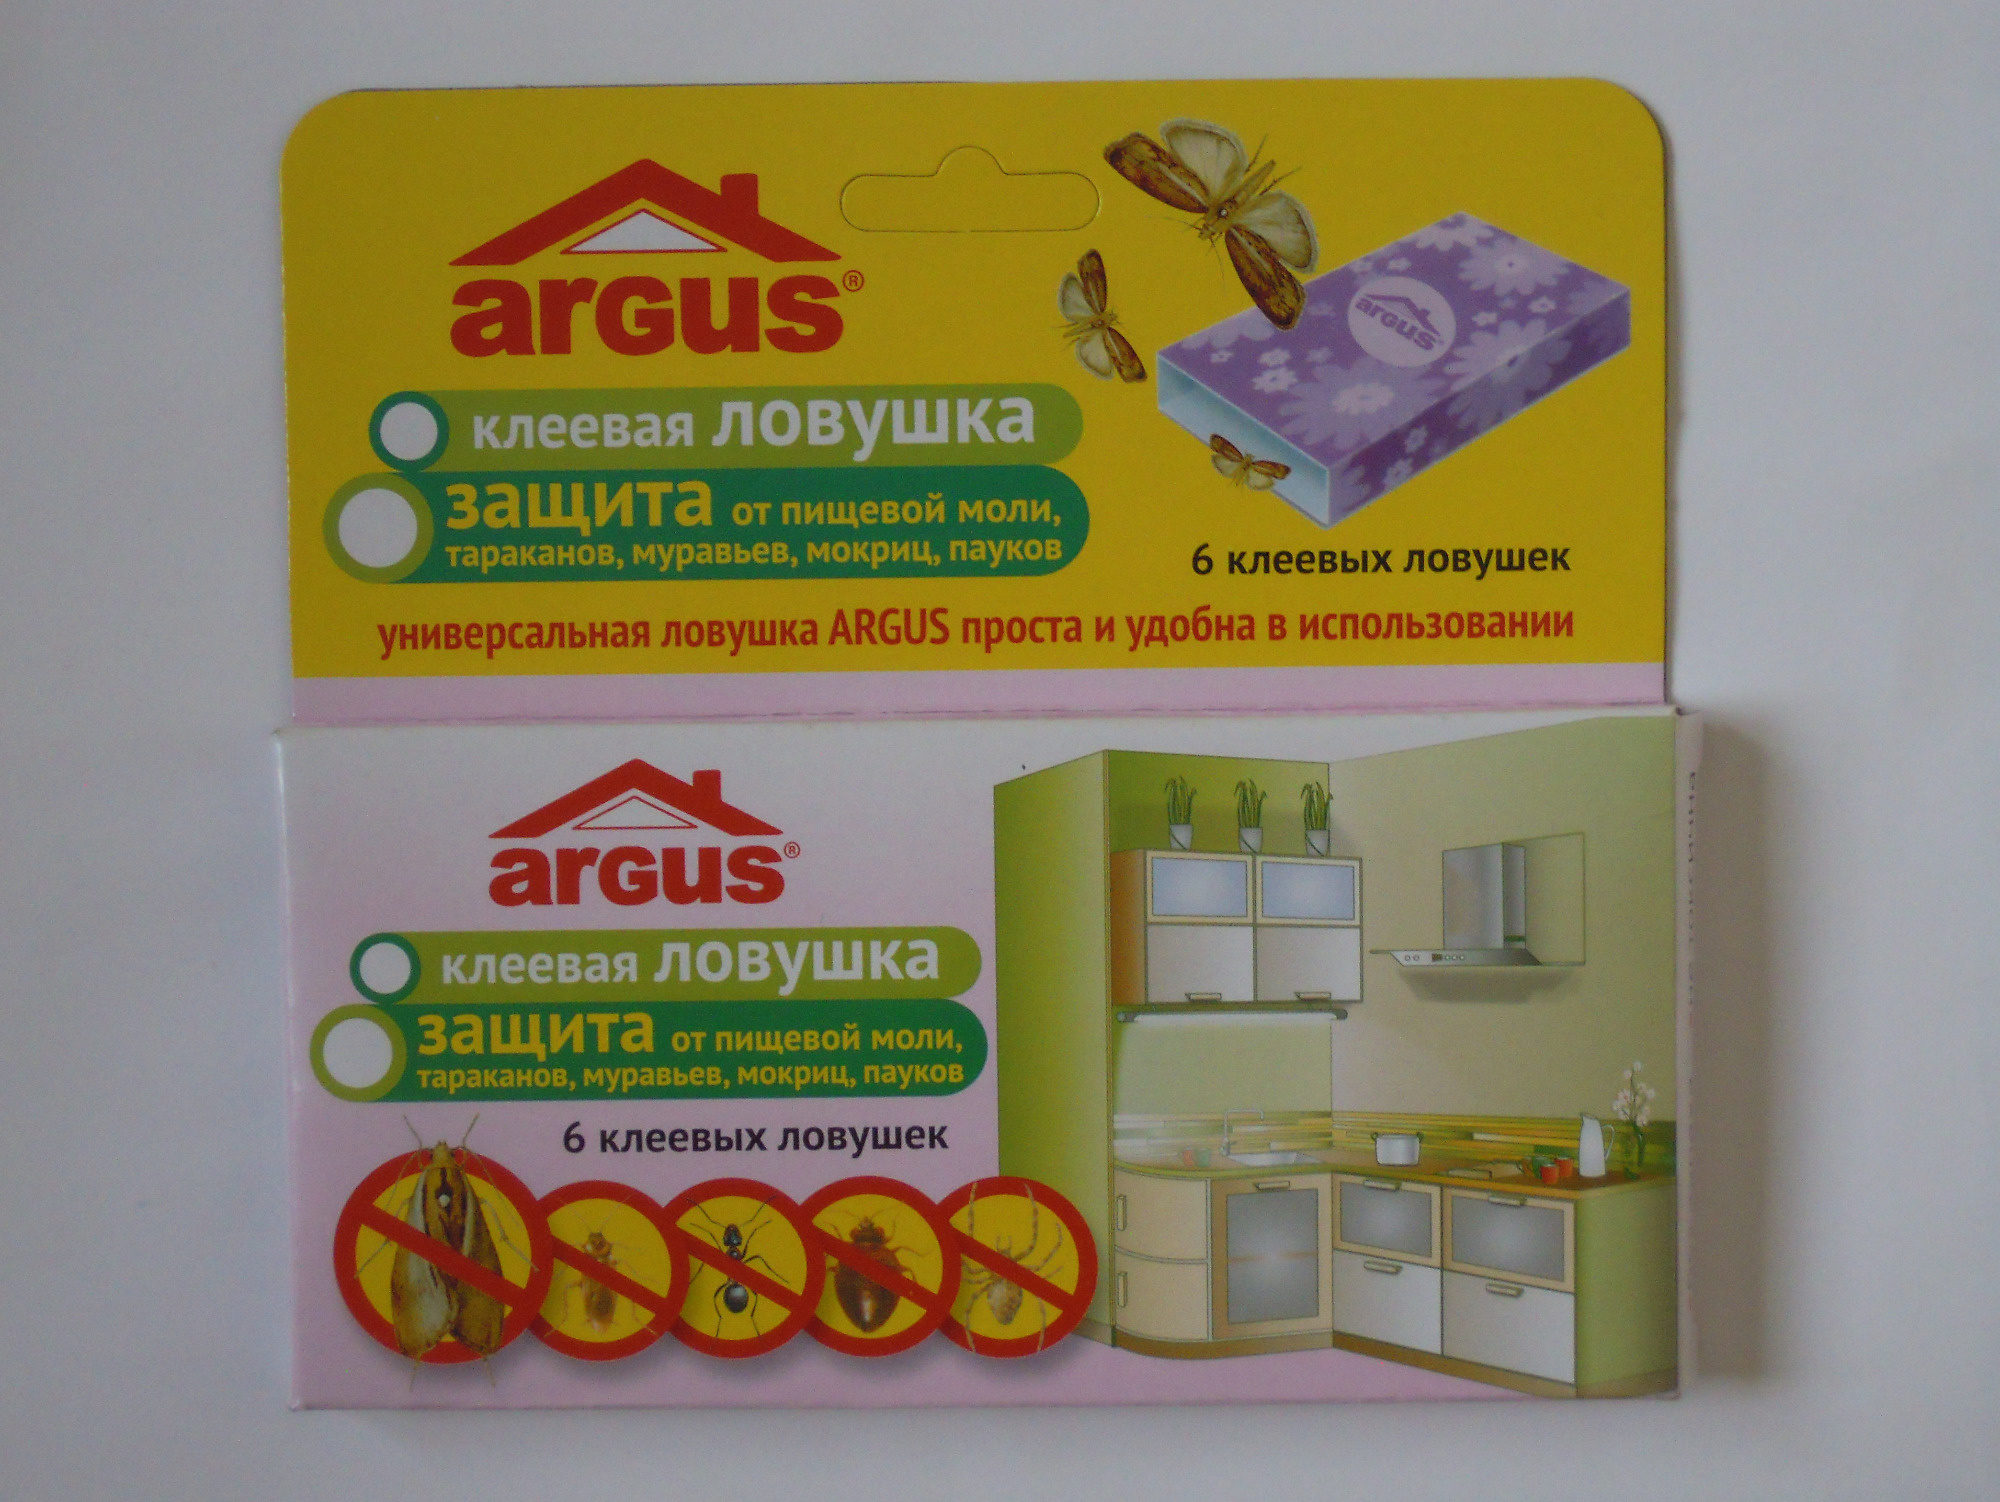 Клеевая ловушка. Защита от пищевой моли, тараканов, муравьев, мокриц, пауков. - Product - ru